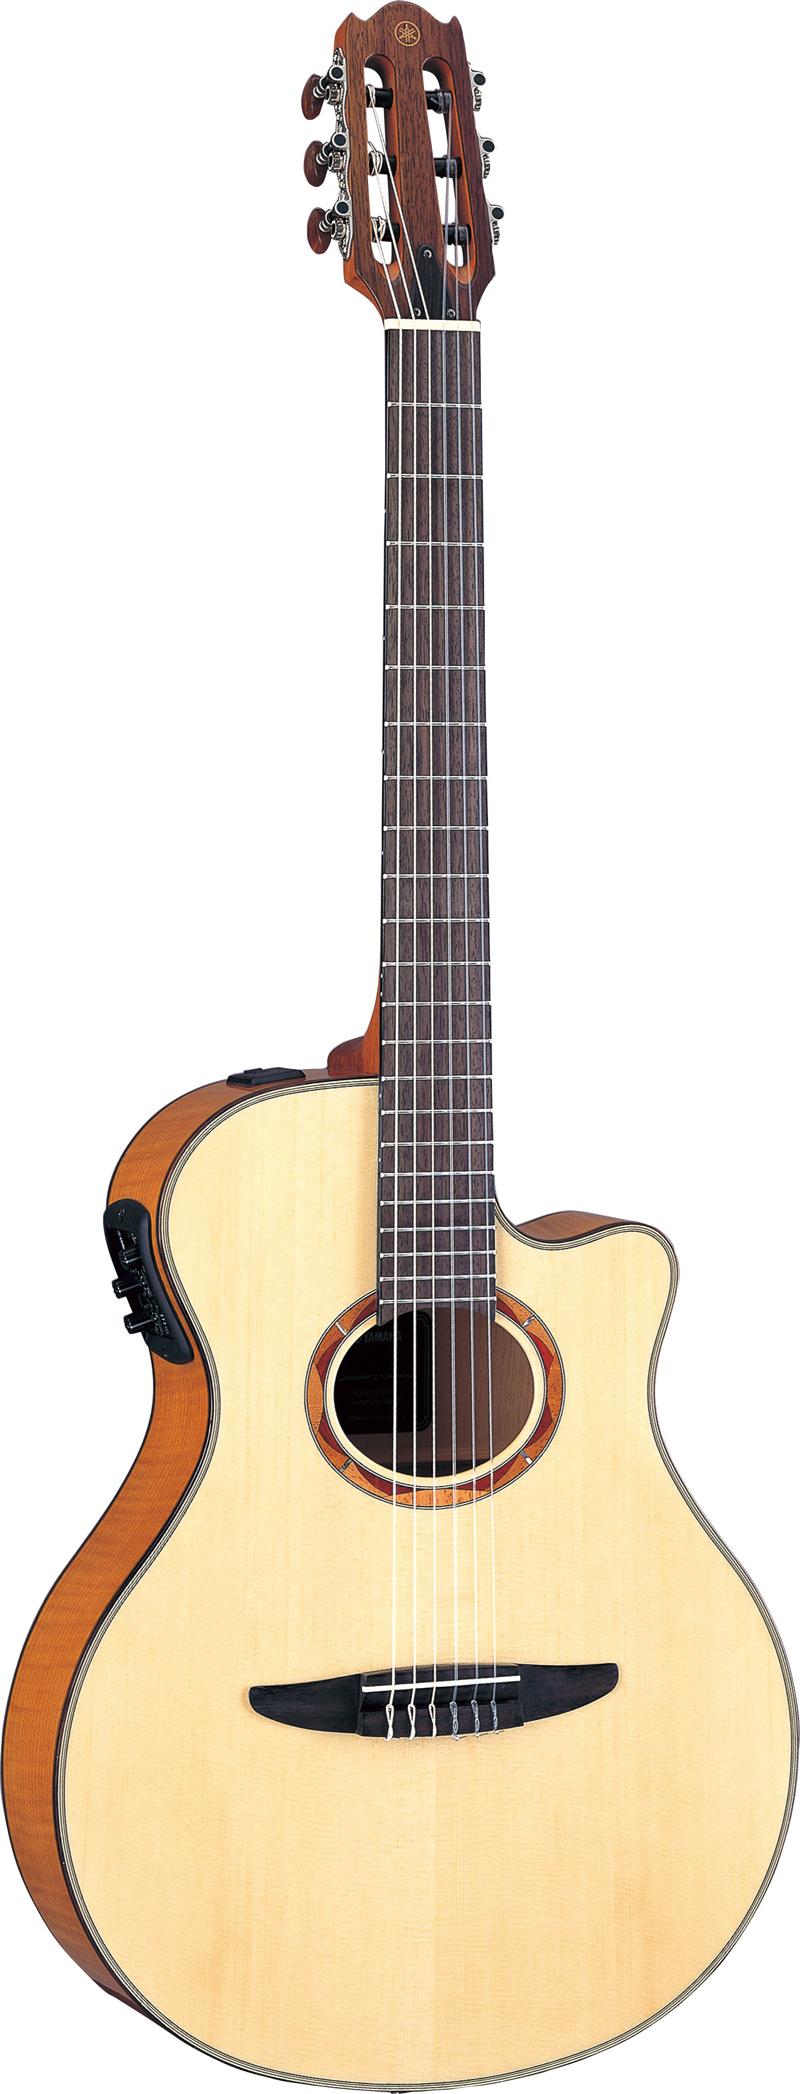 yamaha ntx900 fm nylon elektro akustik gitarre inkl. Black Bedroom Furniture Sets. Home Design Ideas